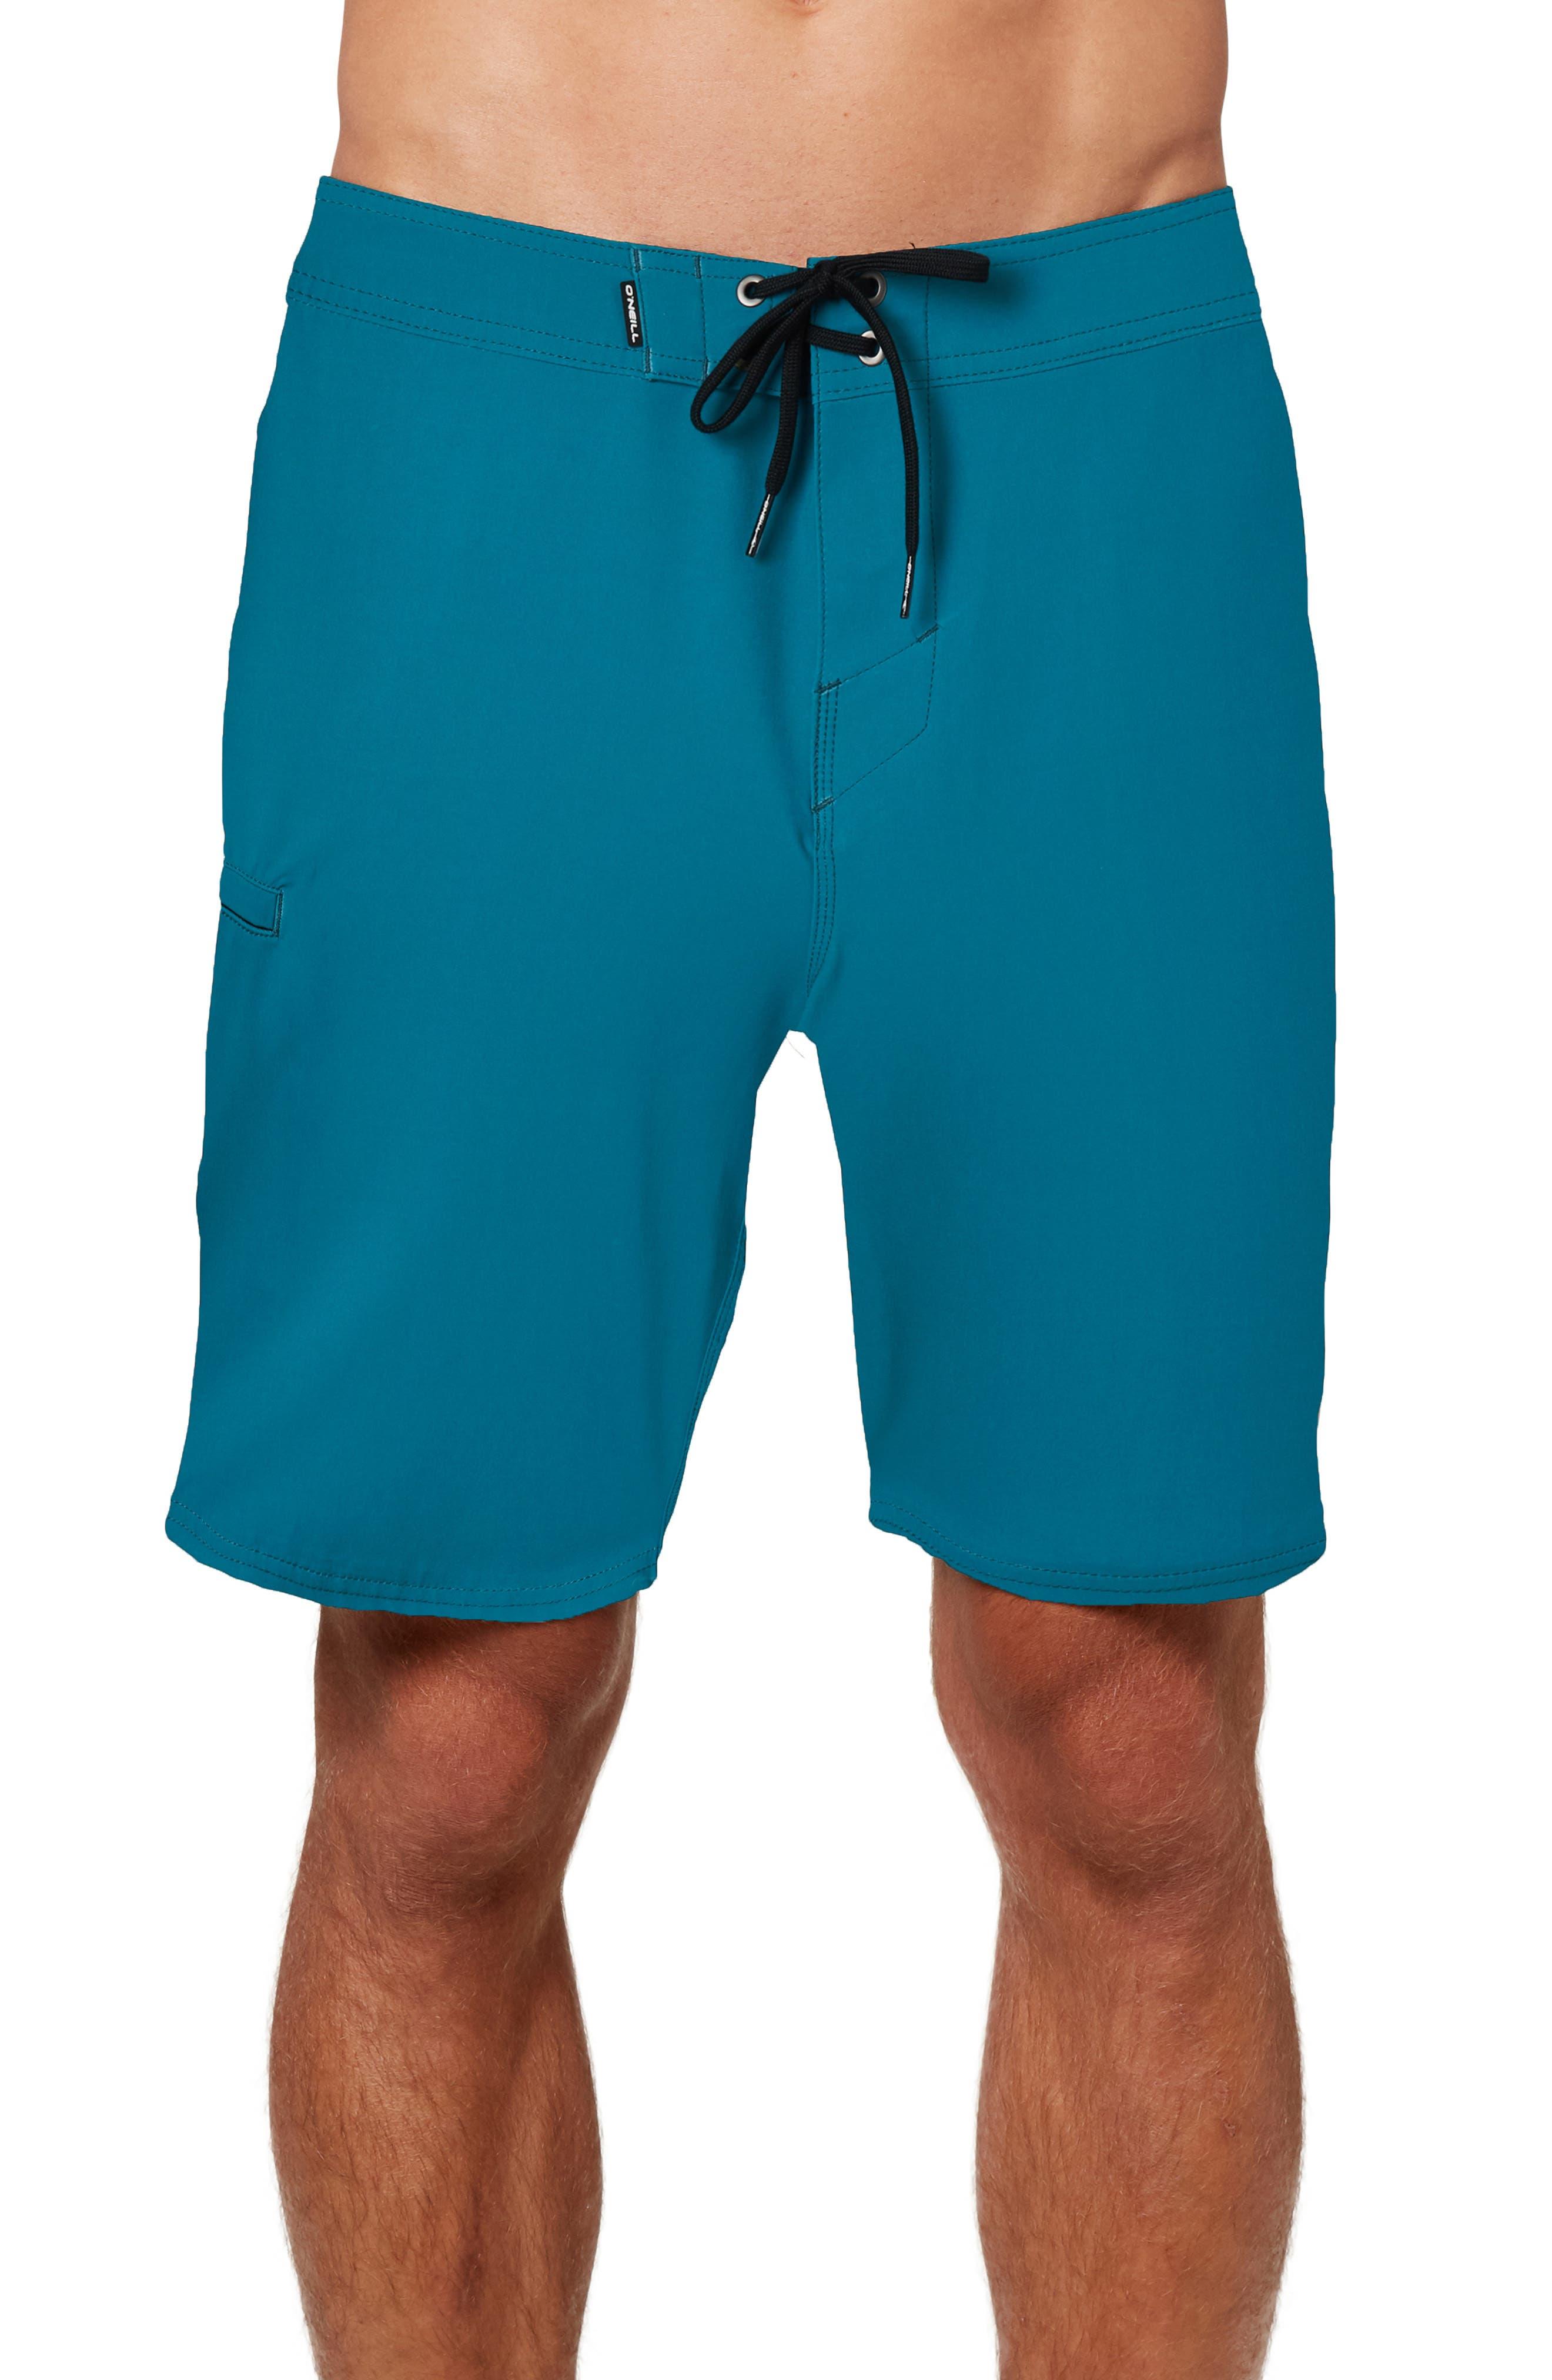 NEW Teal Cove Men/'s Stretch Hybrid Swim Board Shorts Bright Orange ALL SIZES